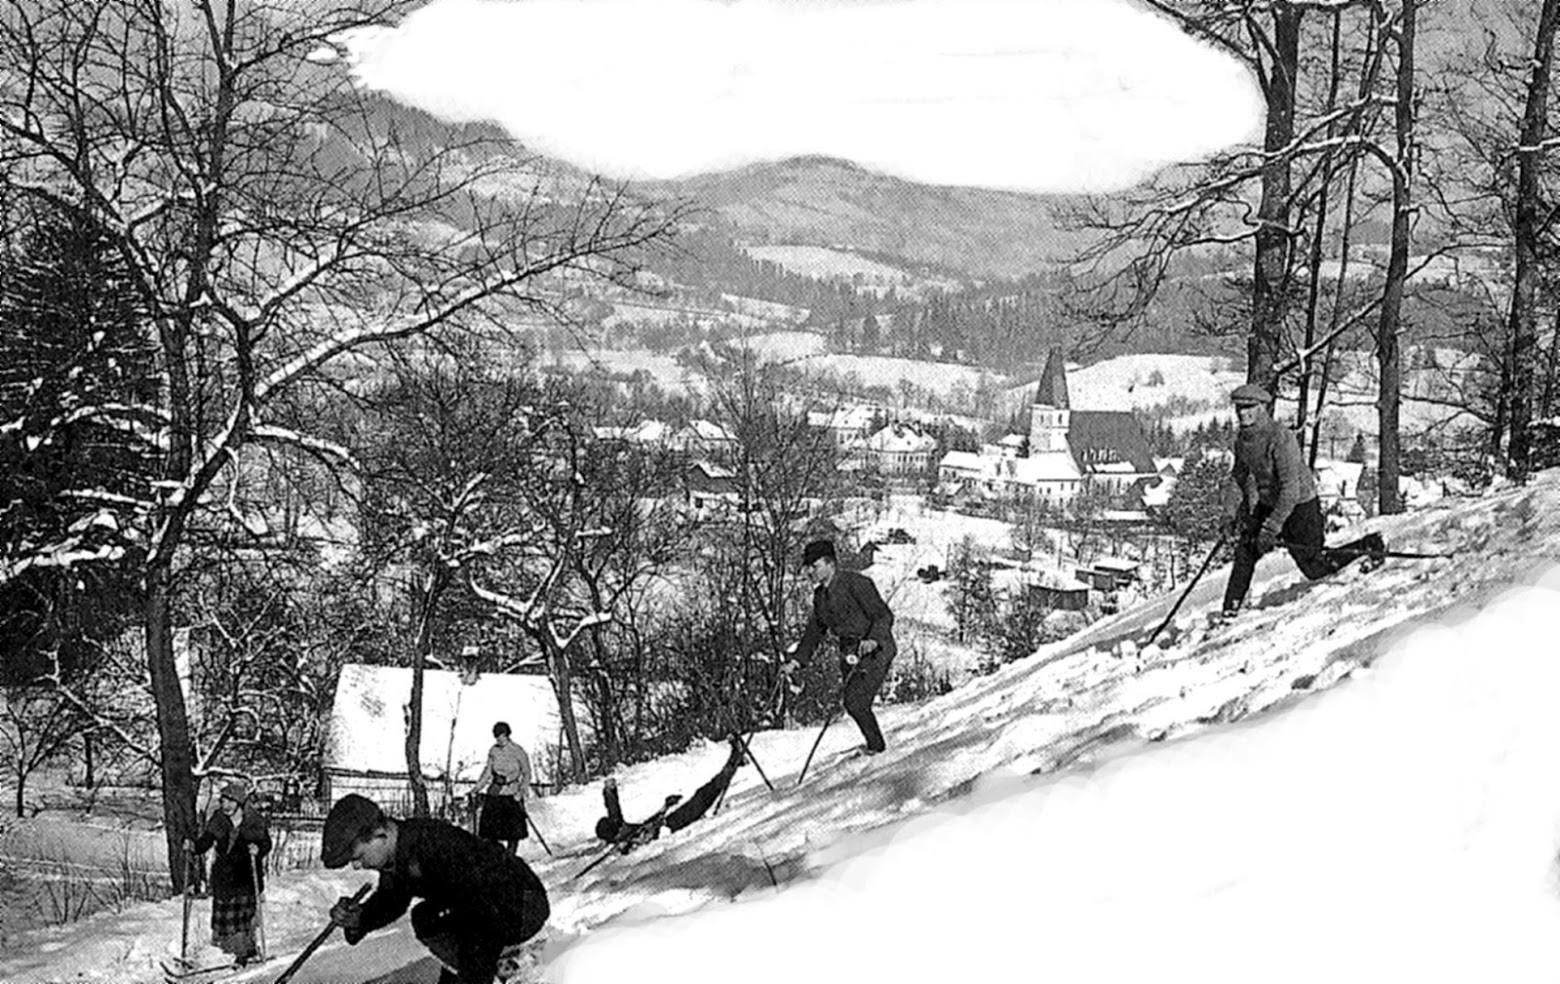 Schifahren in Gresten.jpg